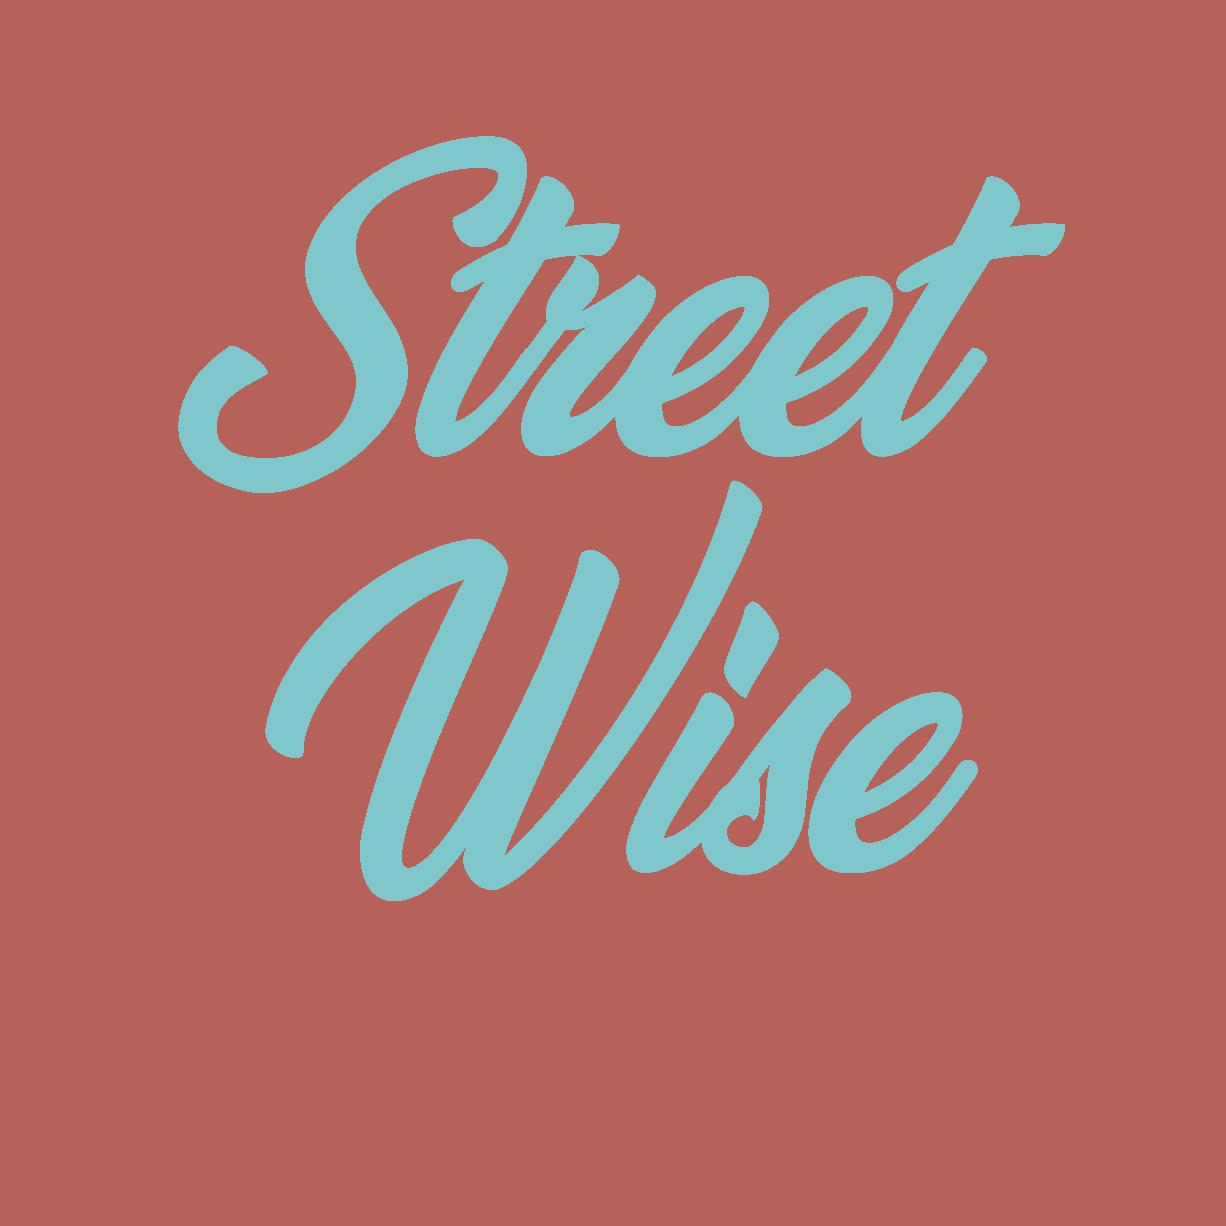 Streetwise_Logo-02